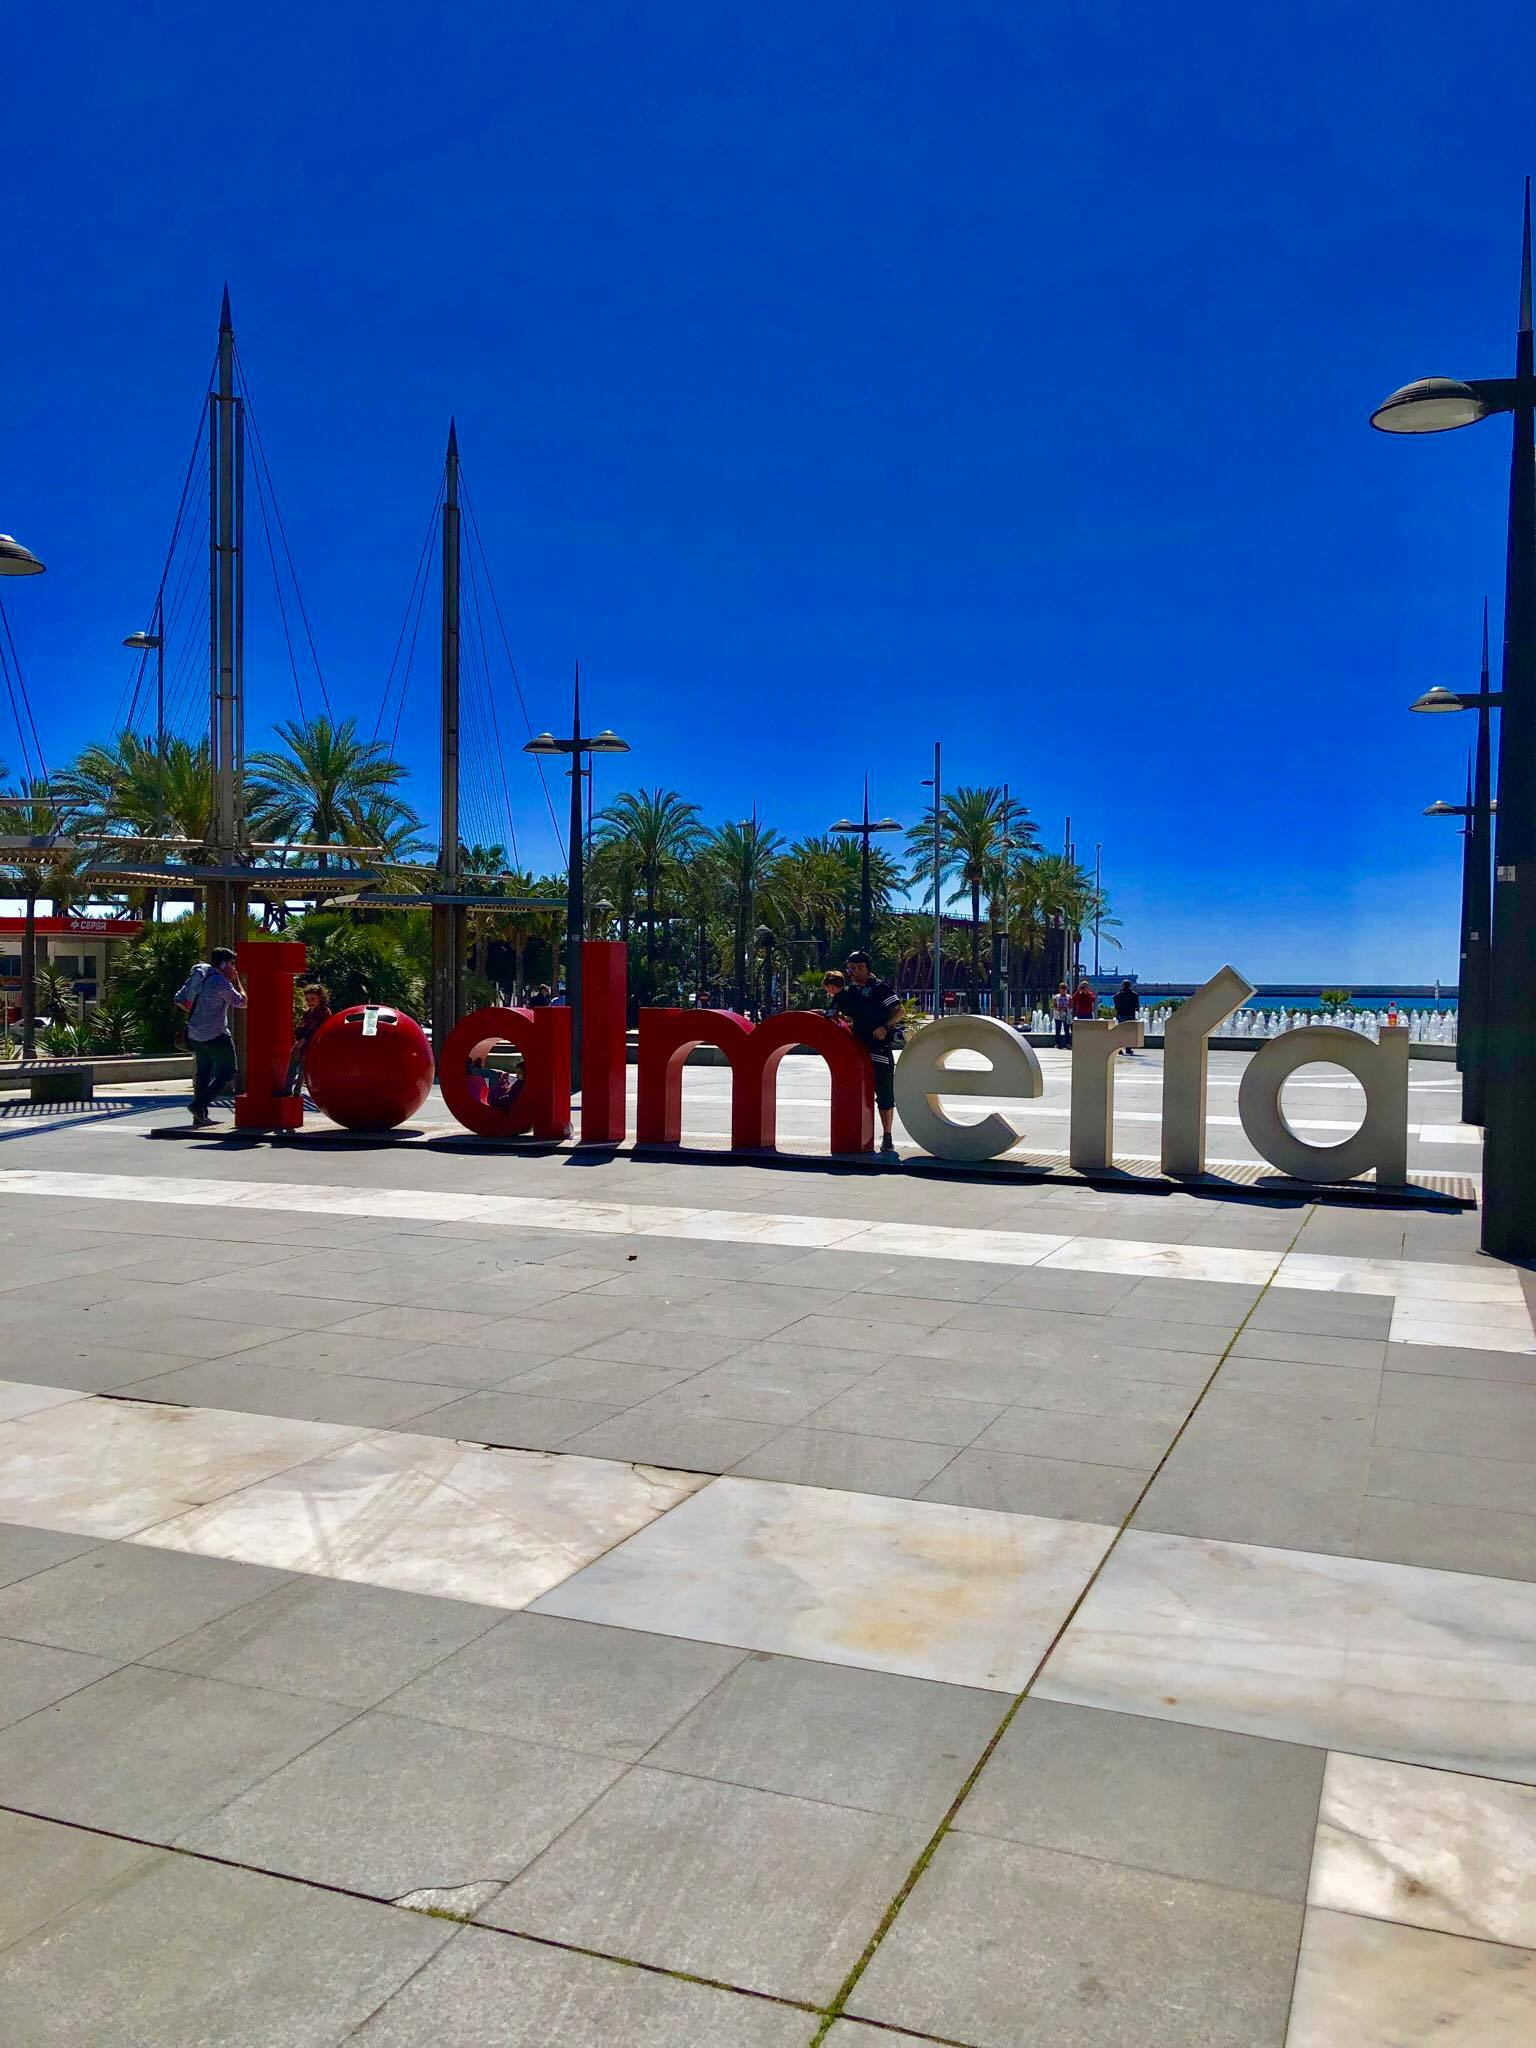 Kach Solo Travels in 2019 Thanks to Cámara de Comercio de Almería3.jpg